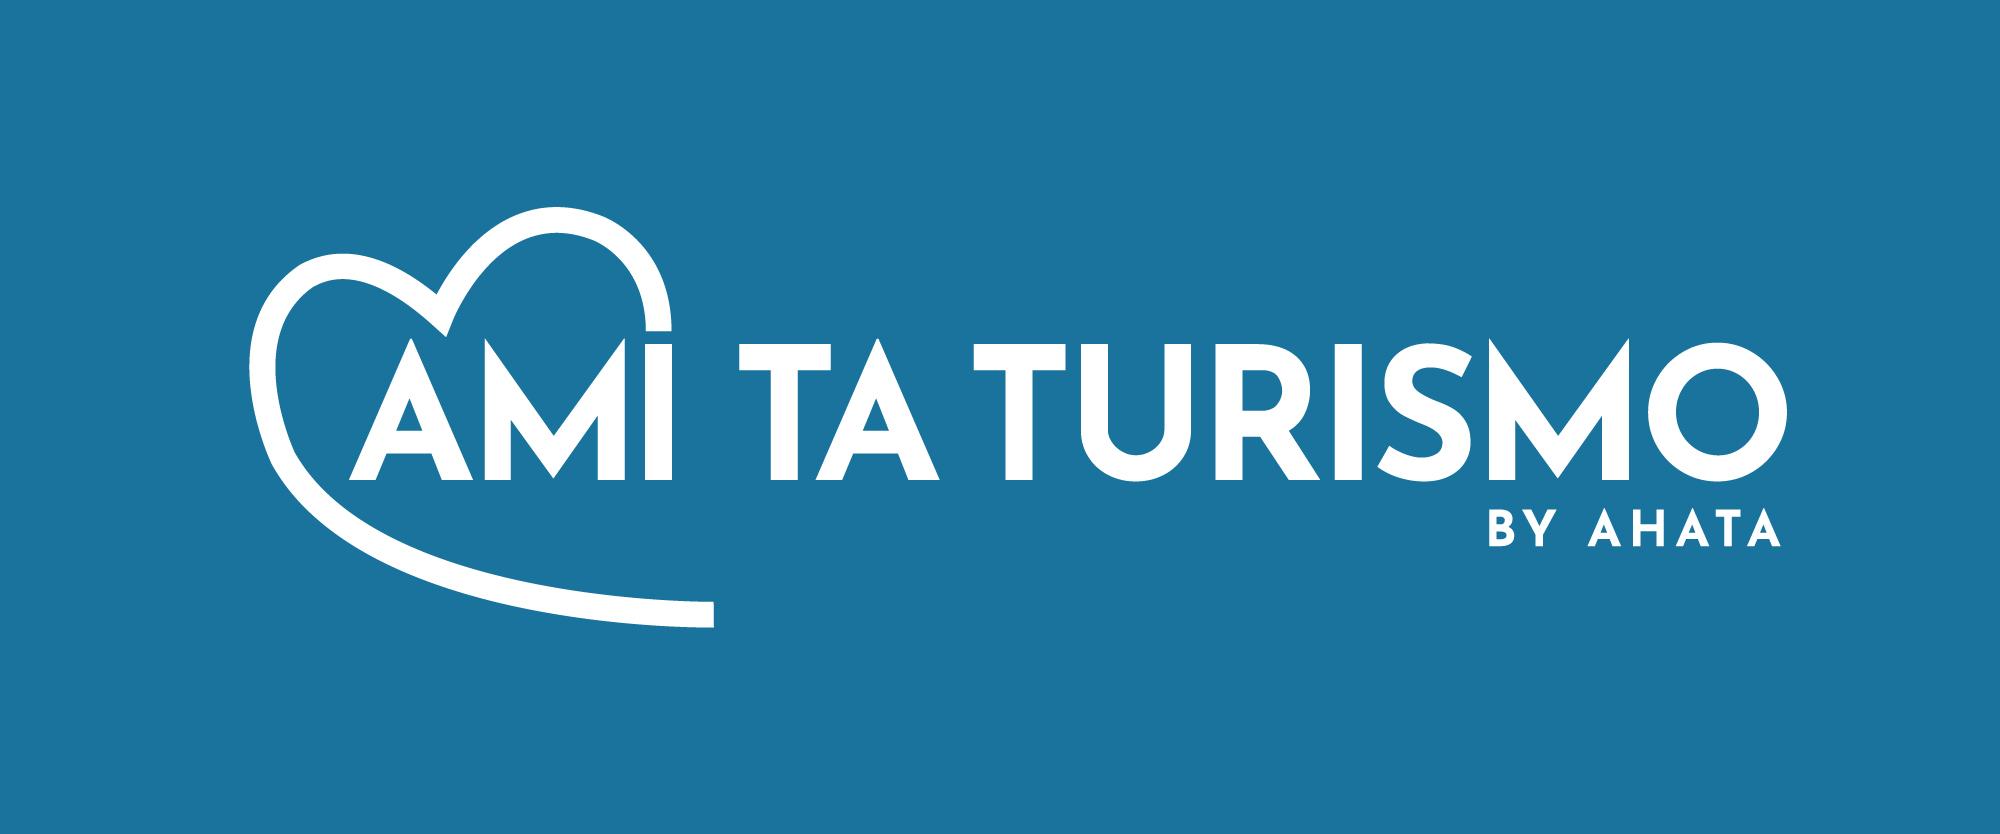 Ami ta turismo